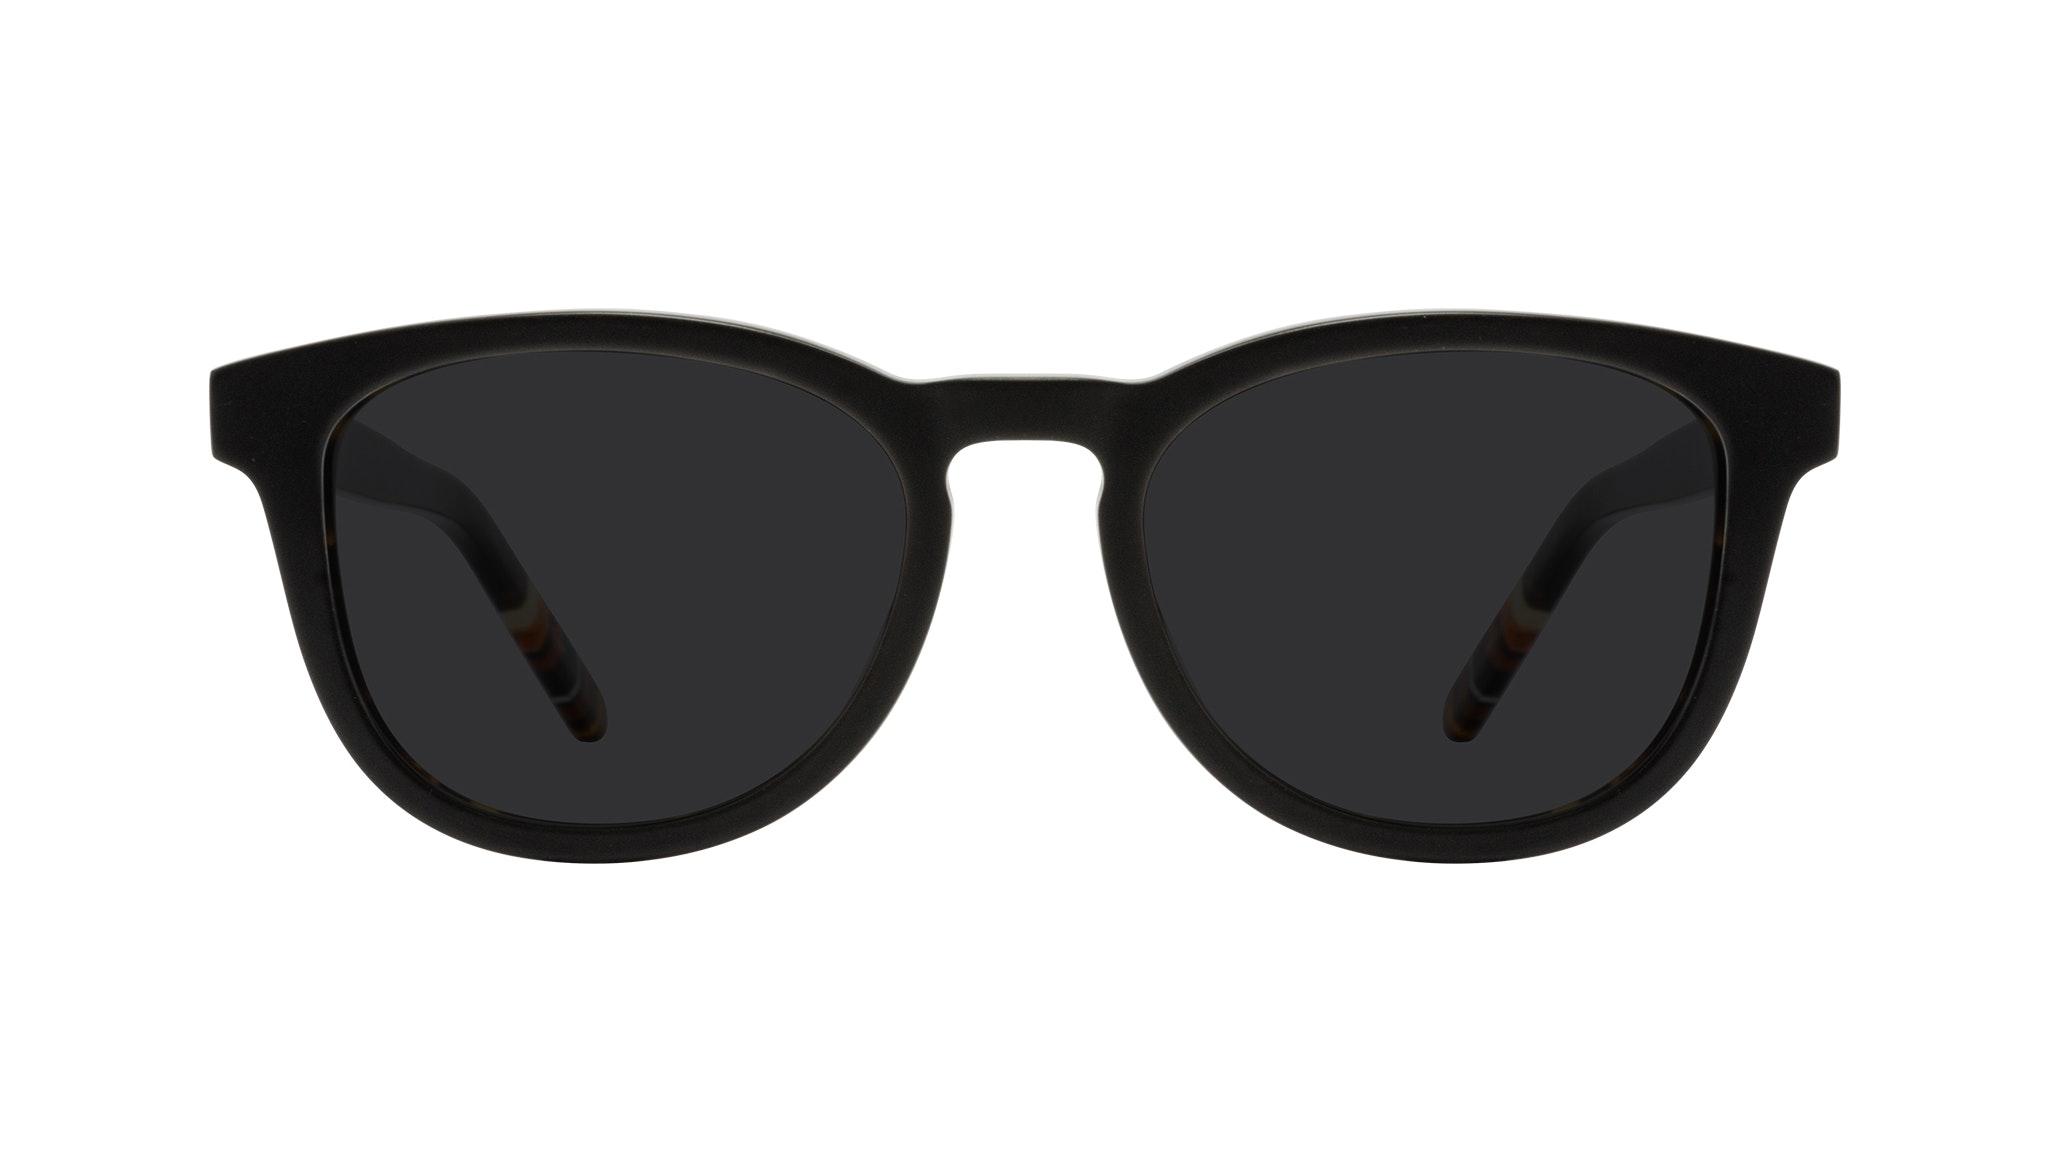 Affordable Fashion Glasses Round Sunglasses Men Goal Black Tort